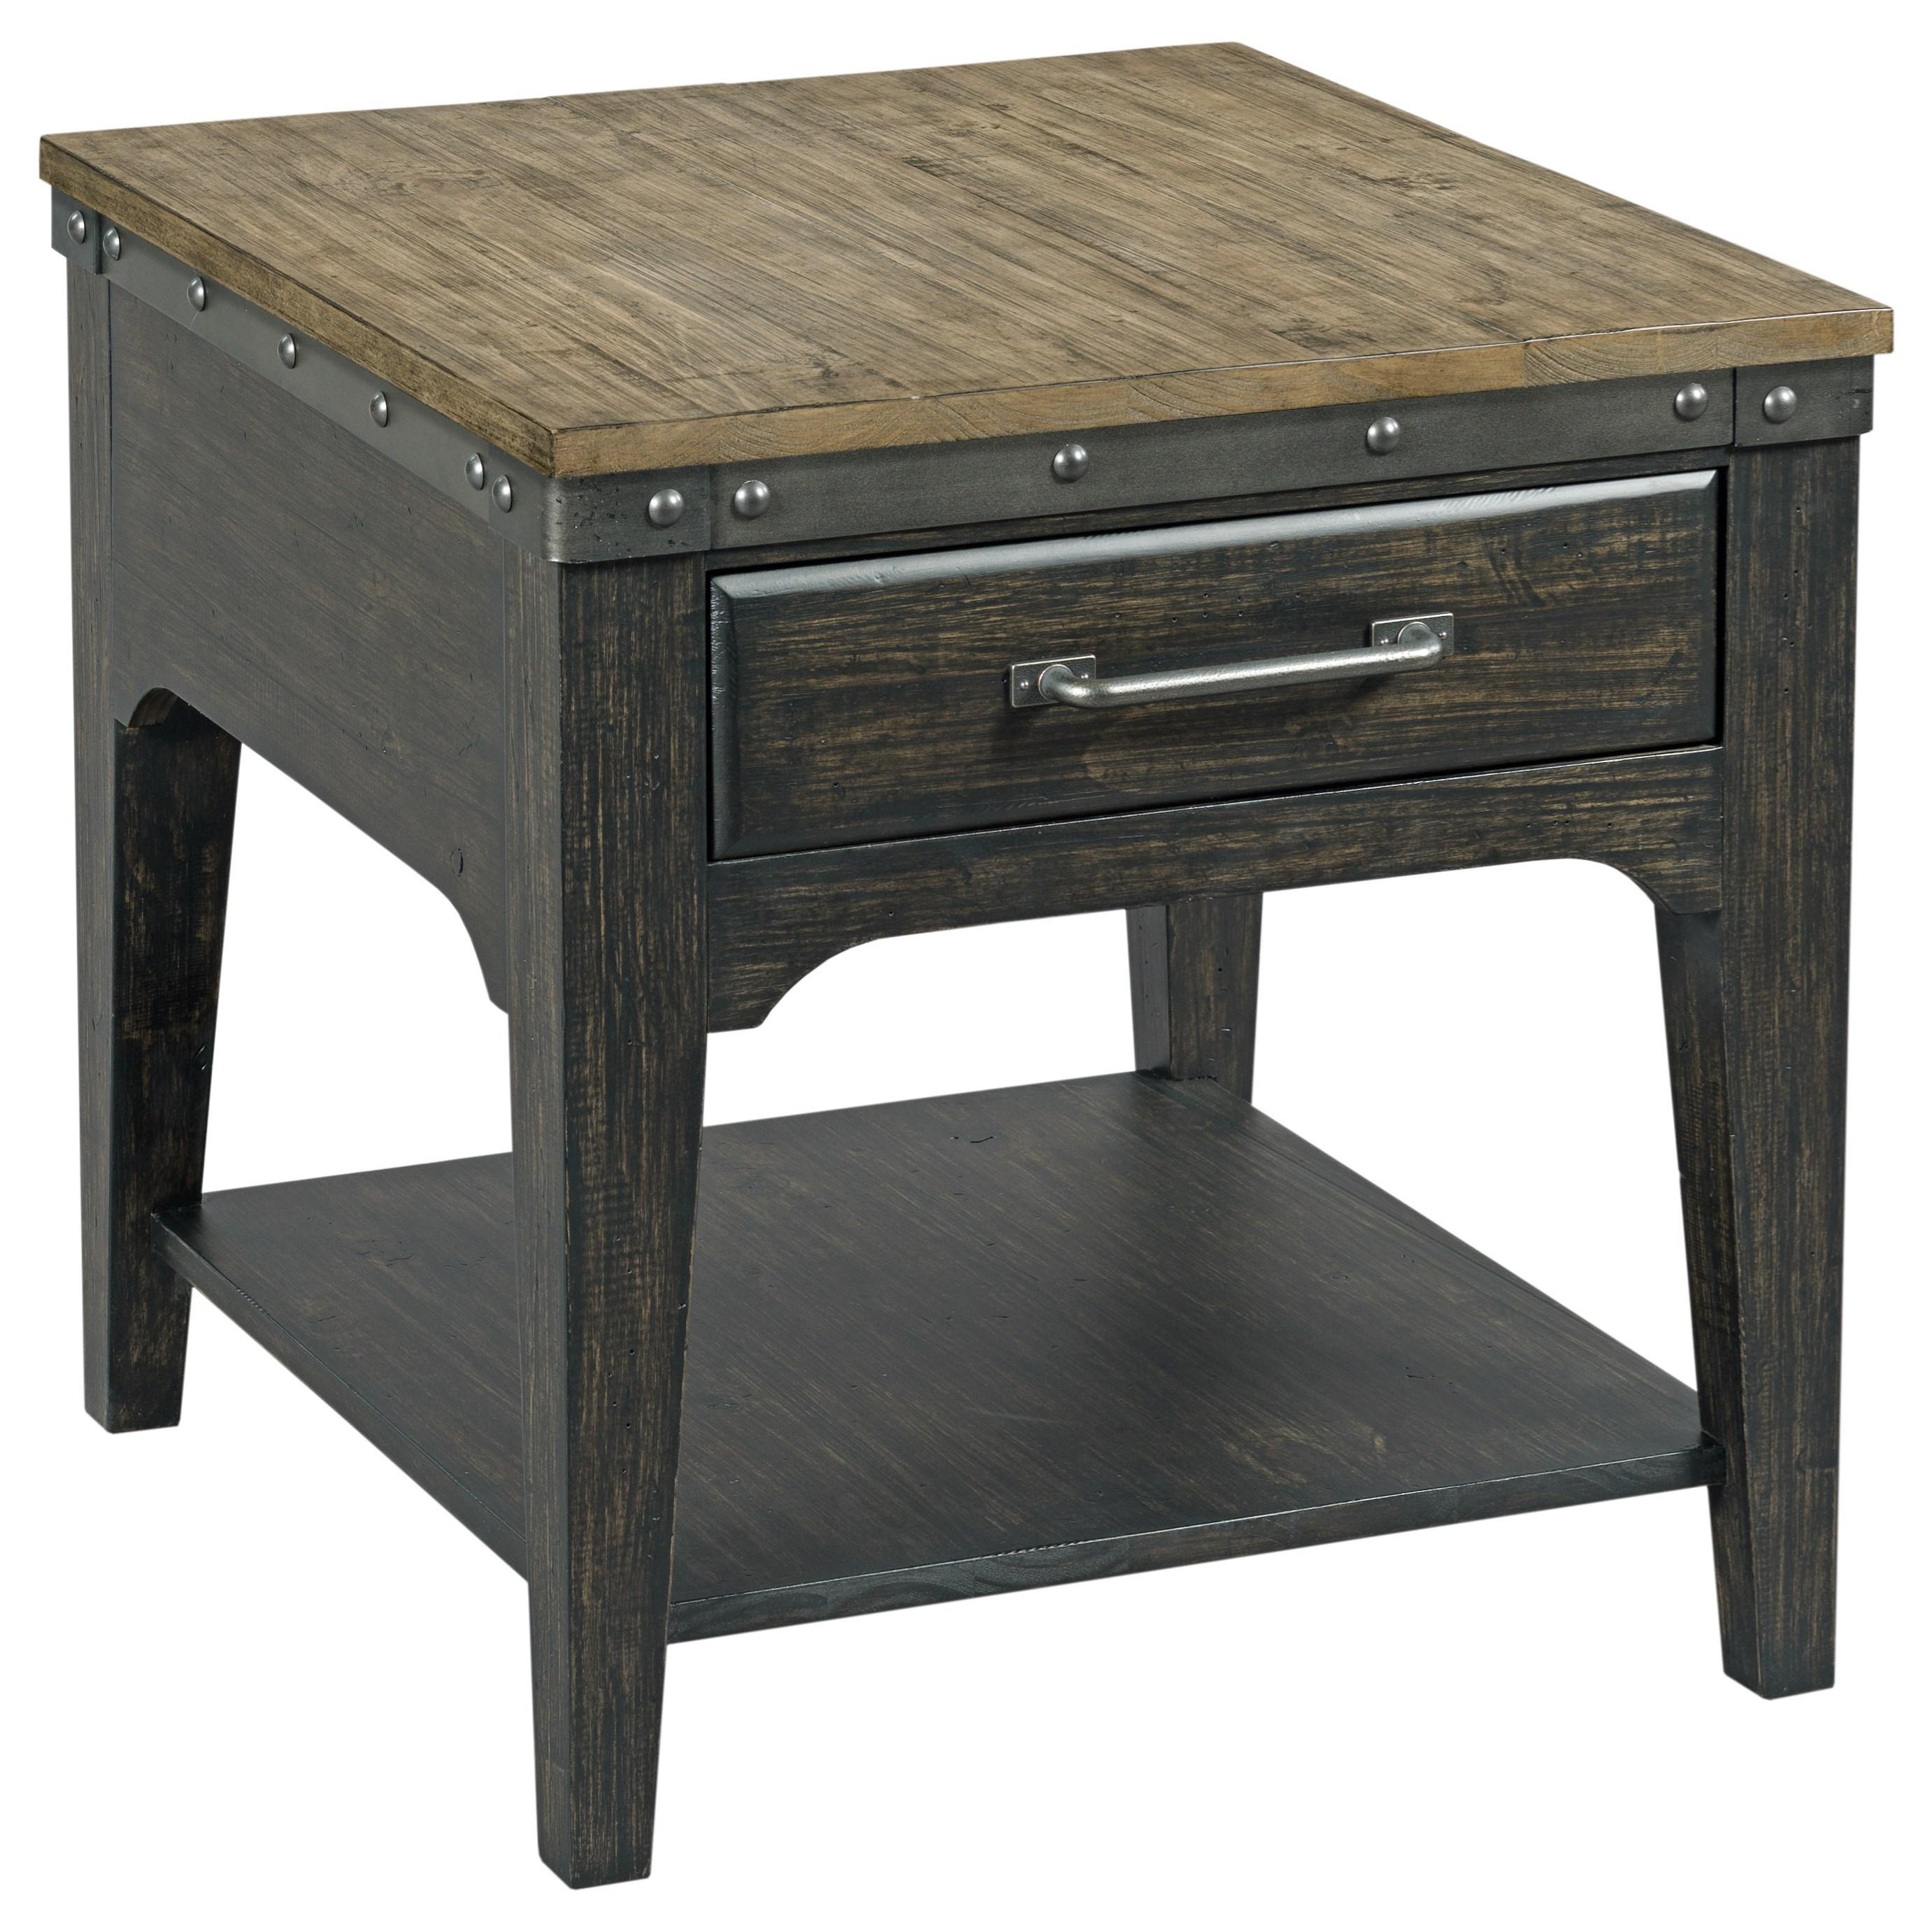 plank road artisans rectangular drawer end table